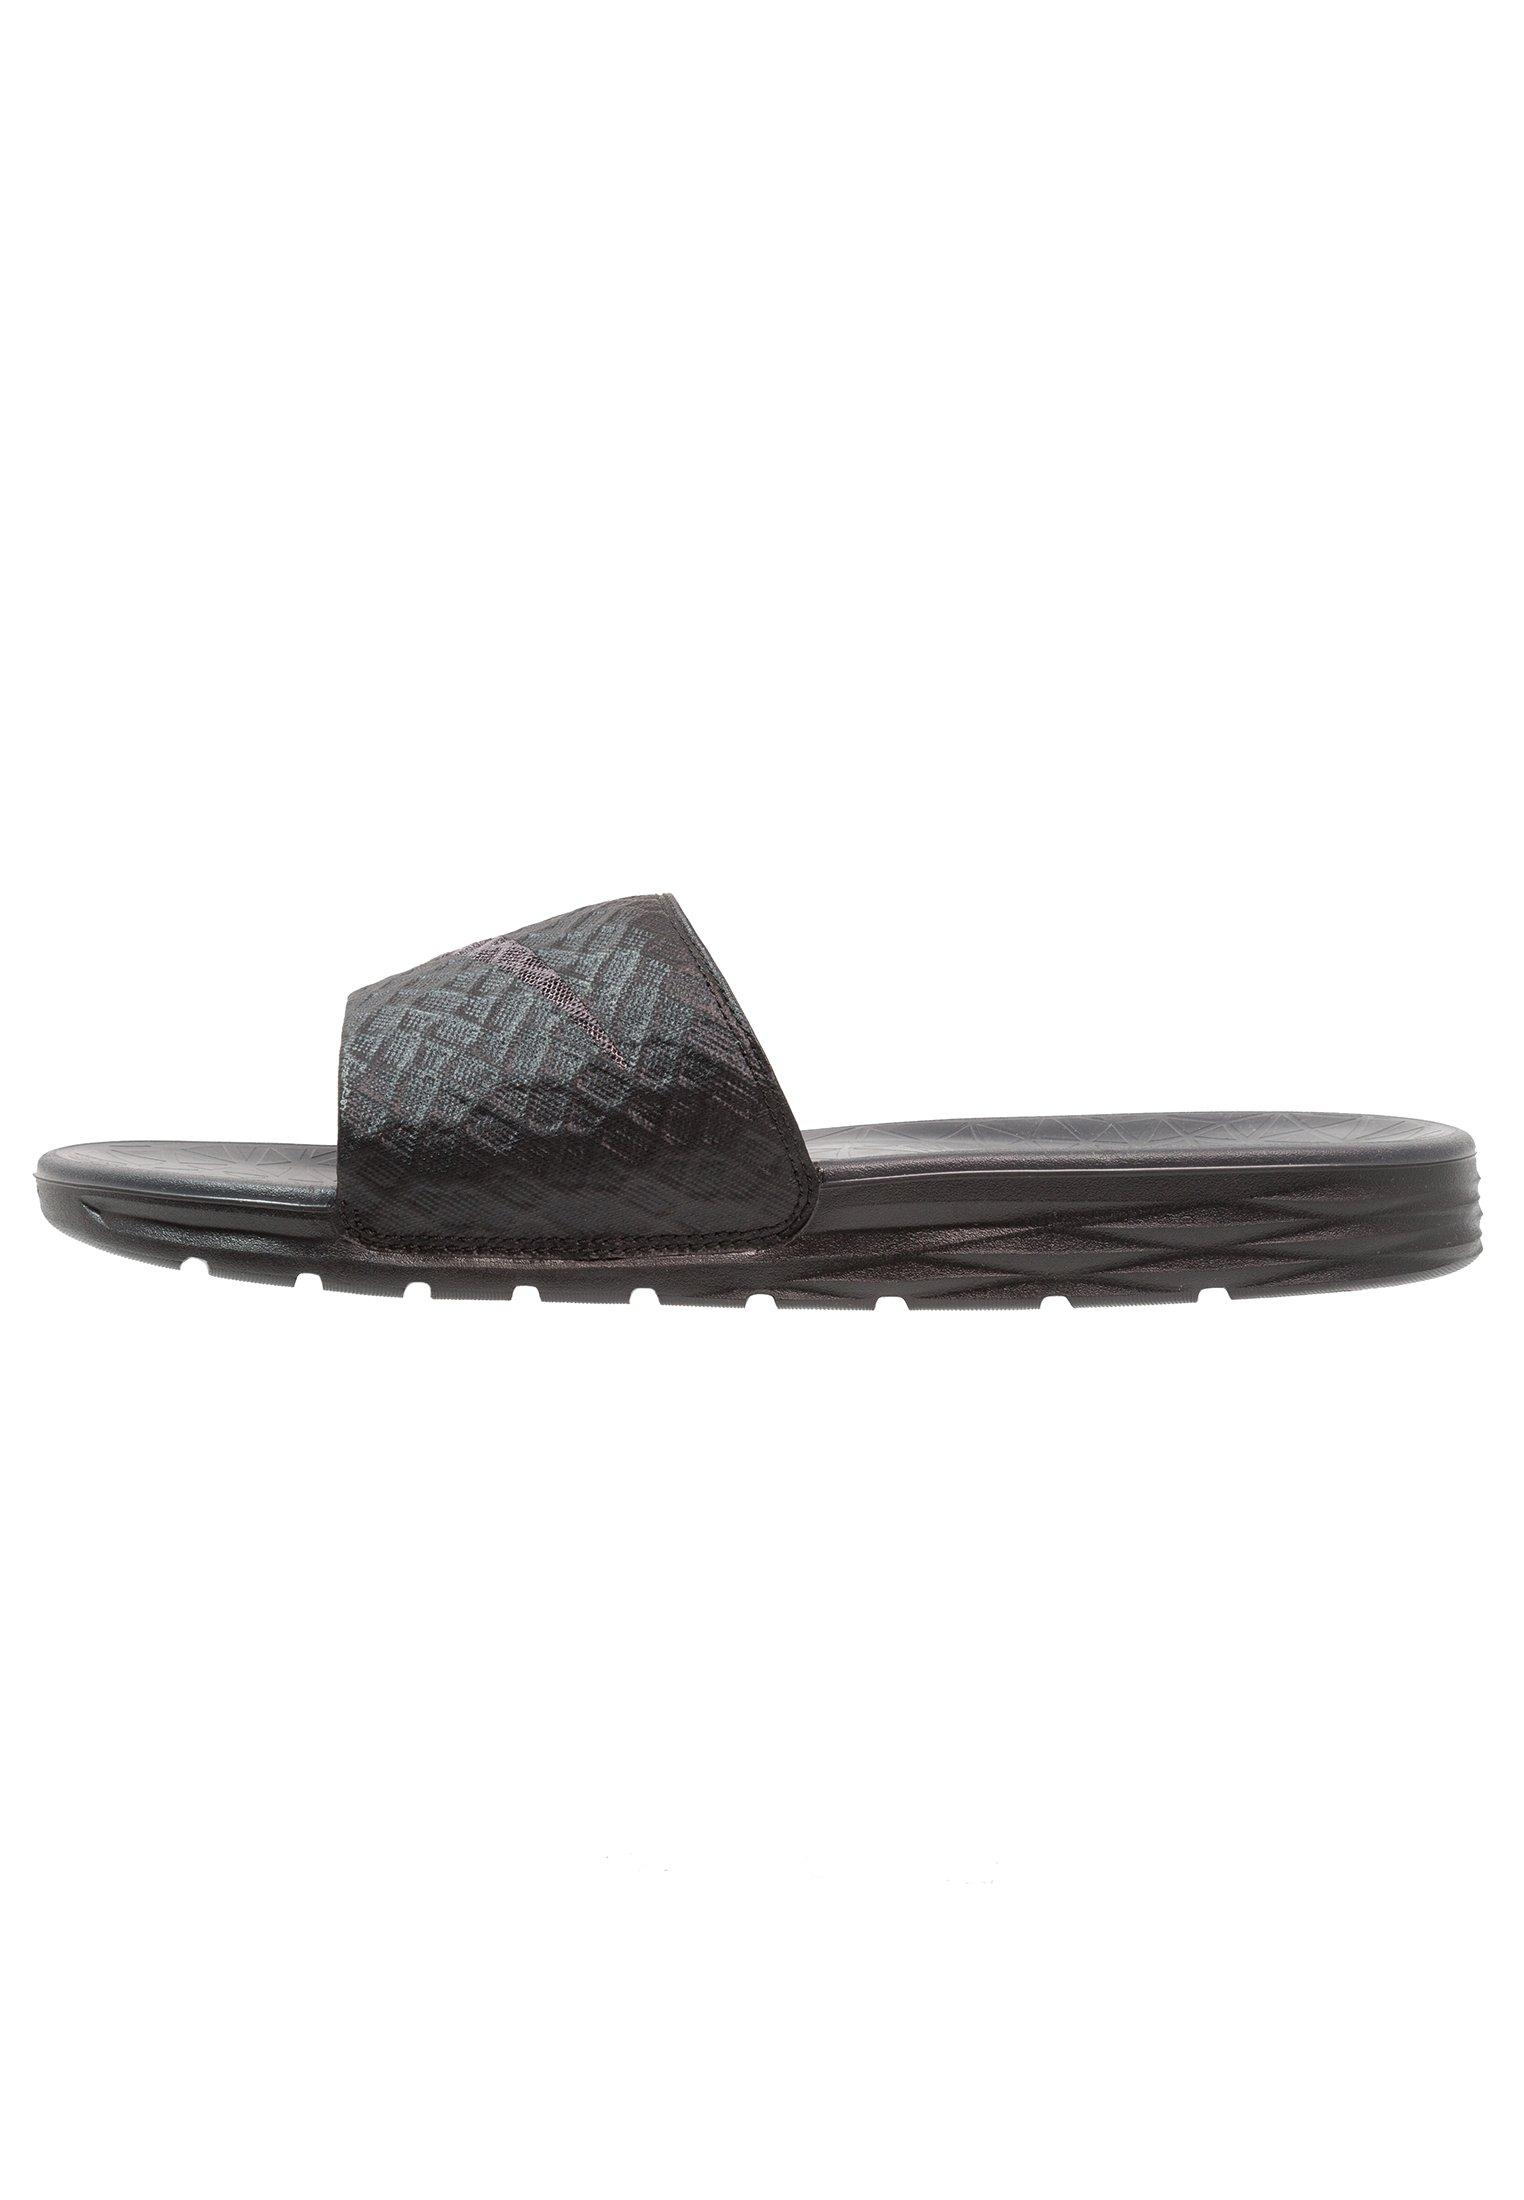 Chaussures de Fitness Homme Nike Benassi Solarsoft